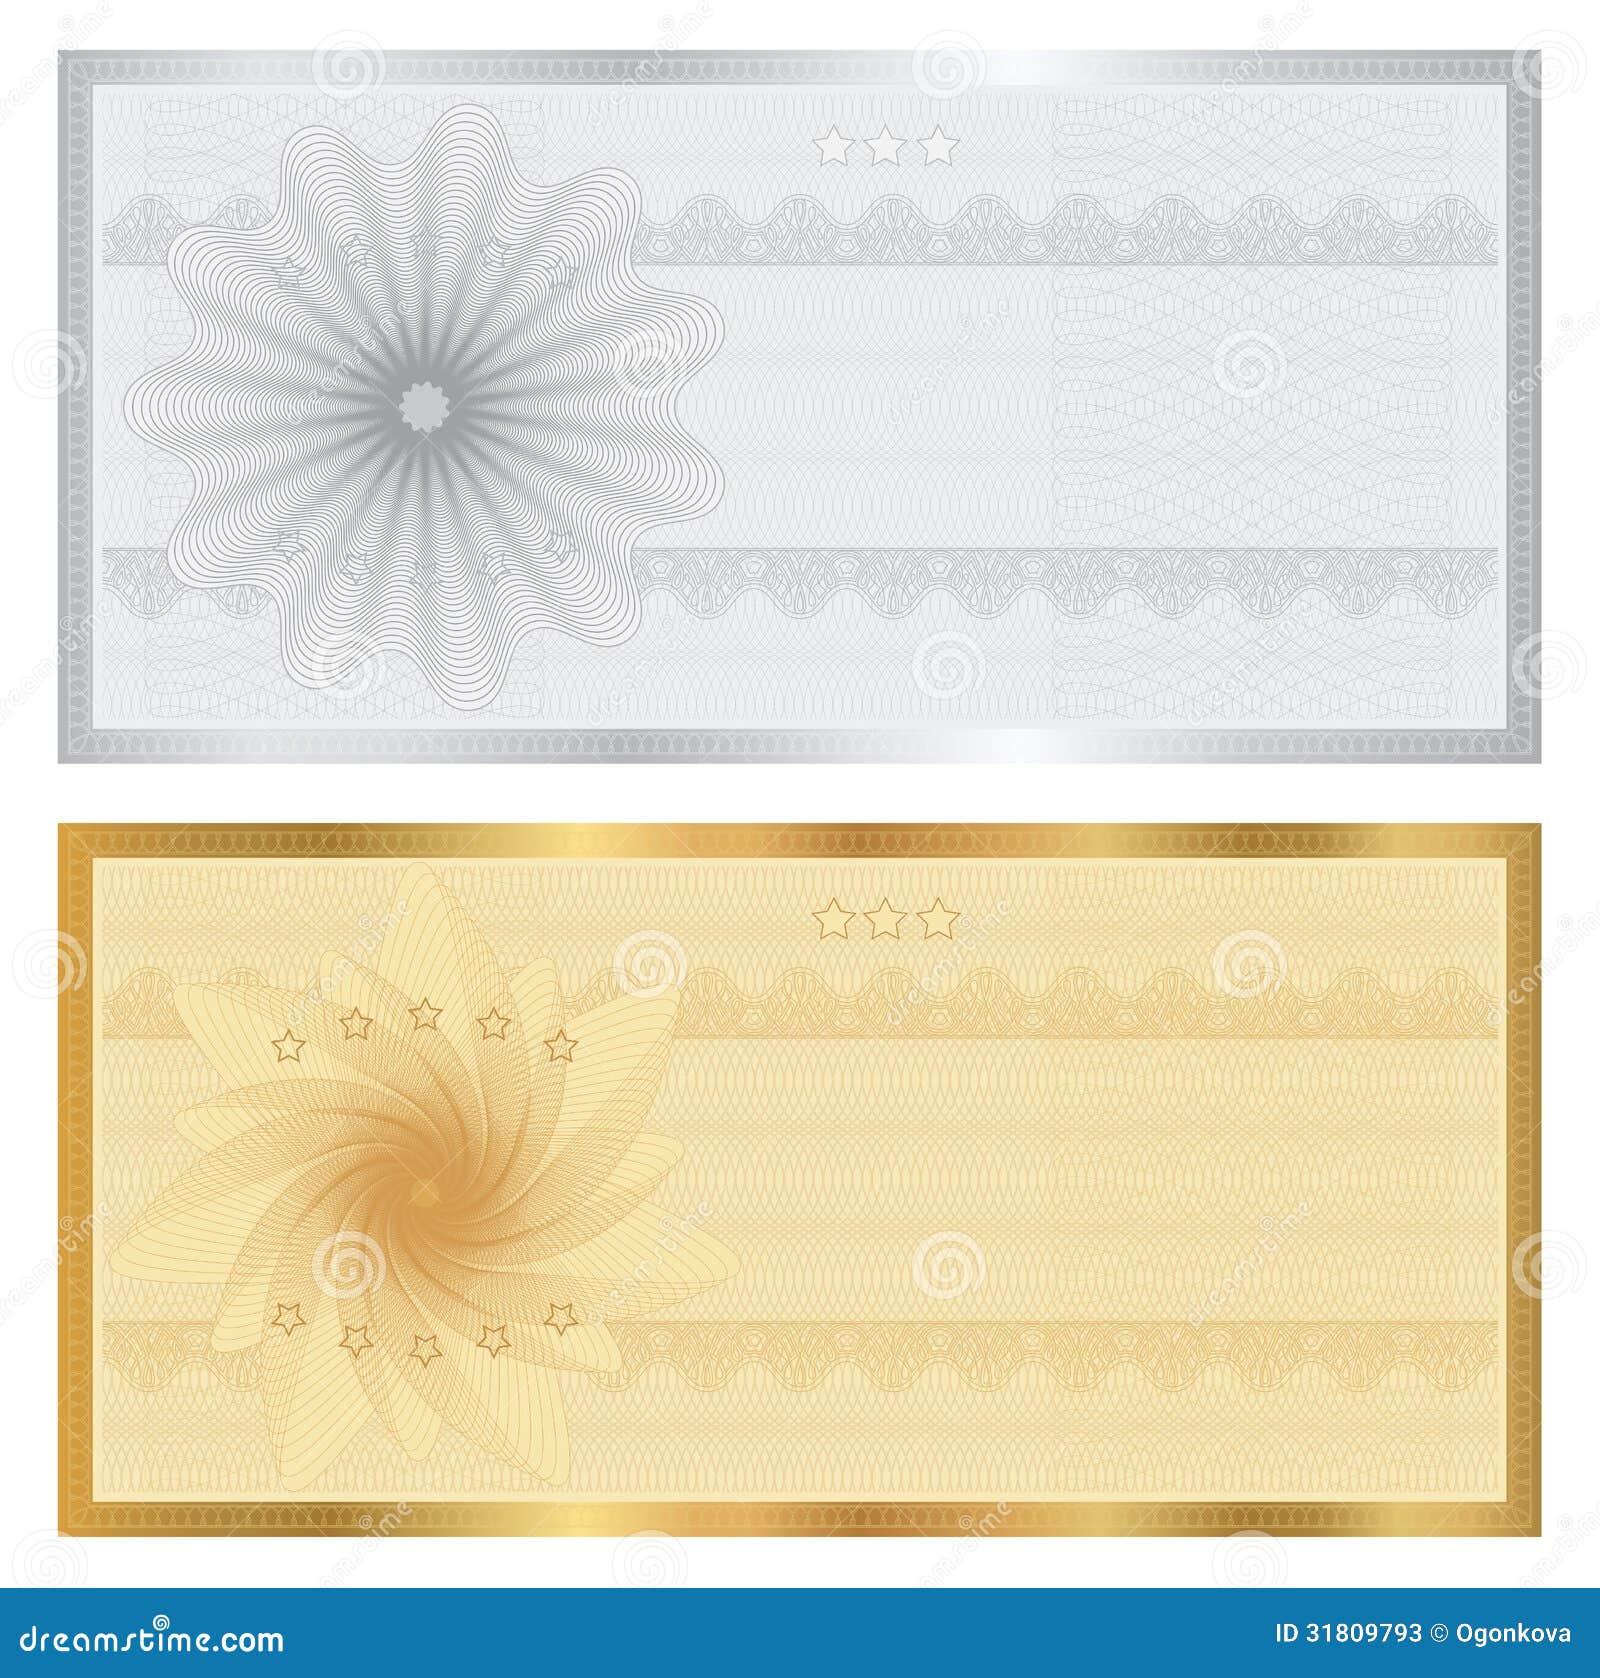 presentkort mall indesign